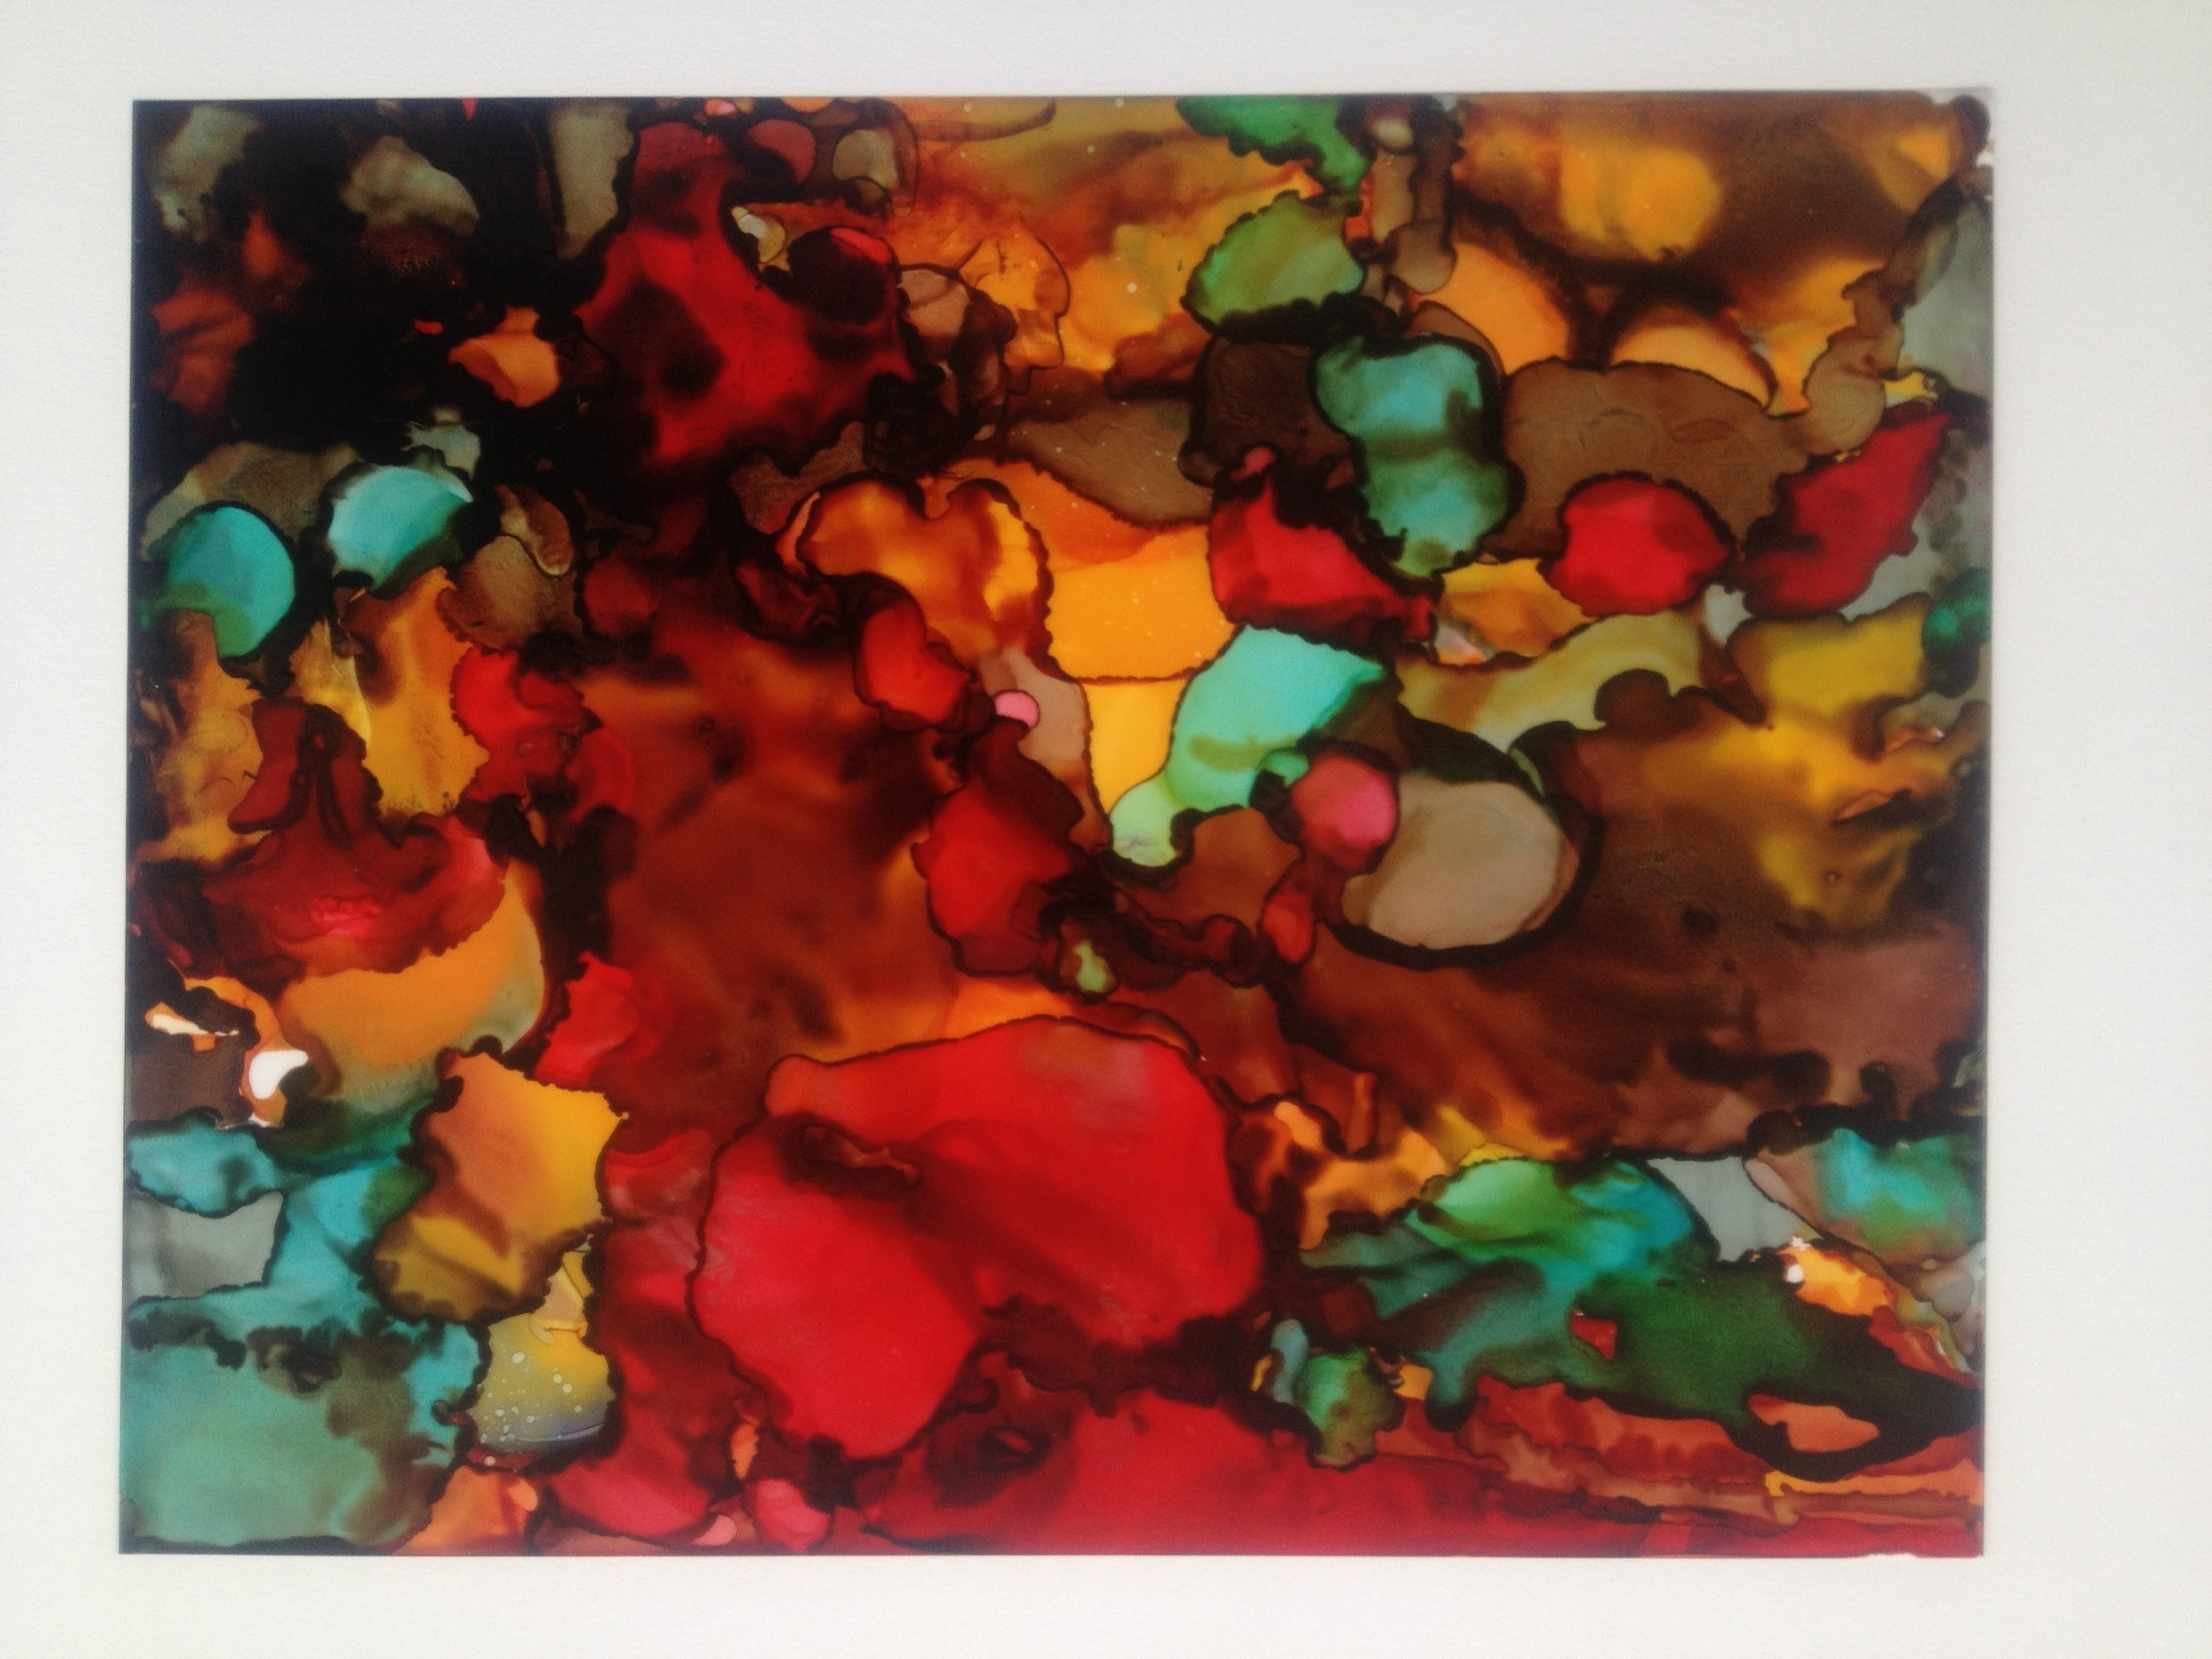 Alcohol ink on yupo paper. SOLD by Jennifer Stone at Jennifer Stone Artwork